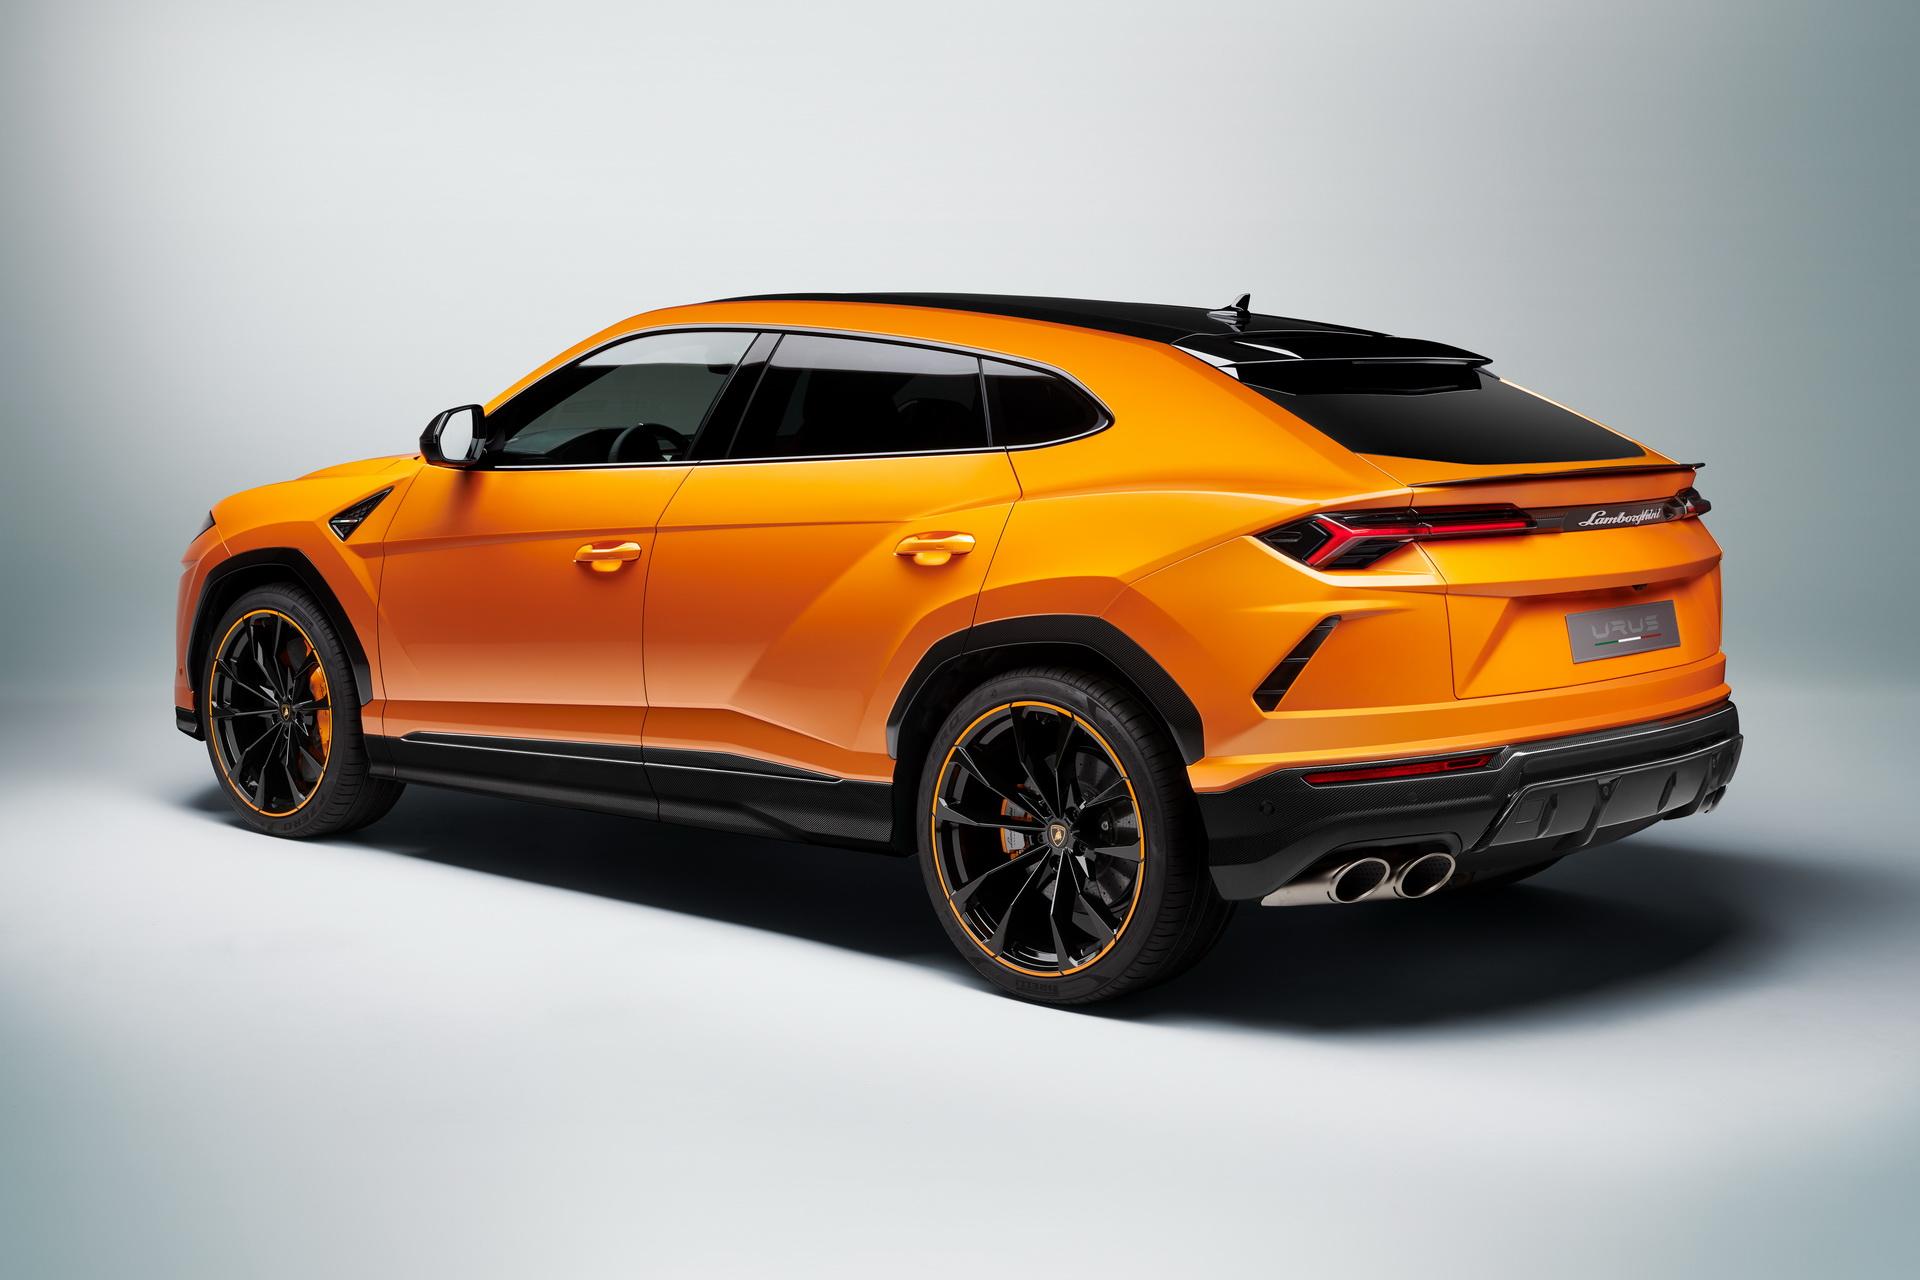 Lamborghini-Urus-Pearl-Capsule-Edition-13